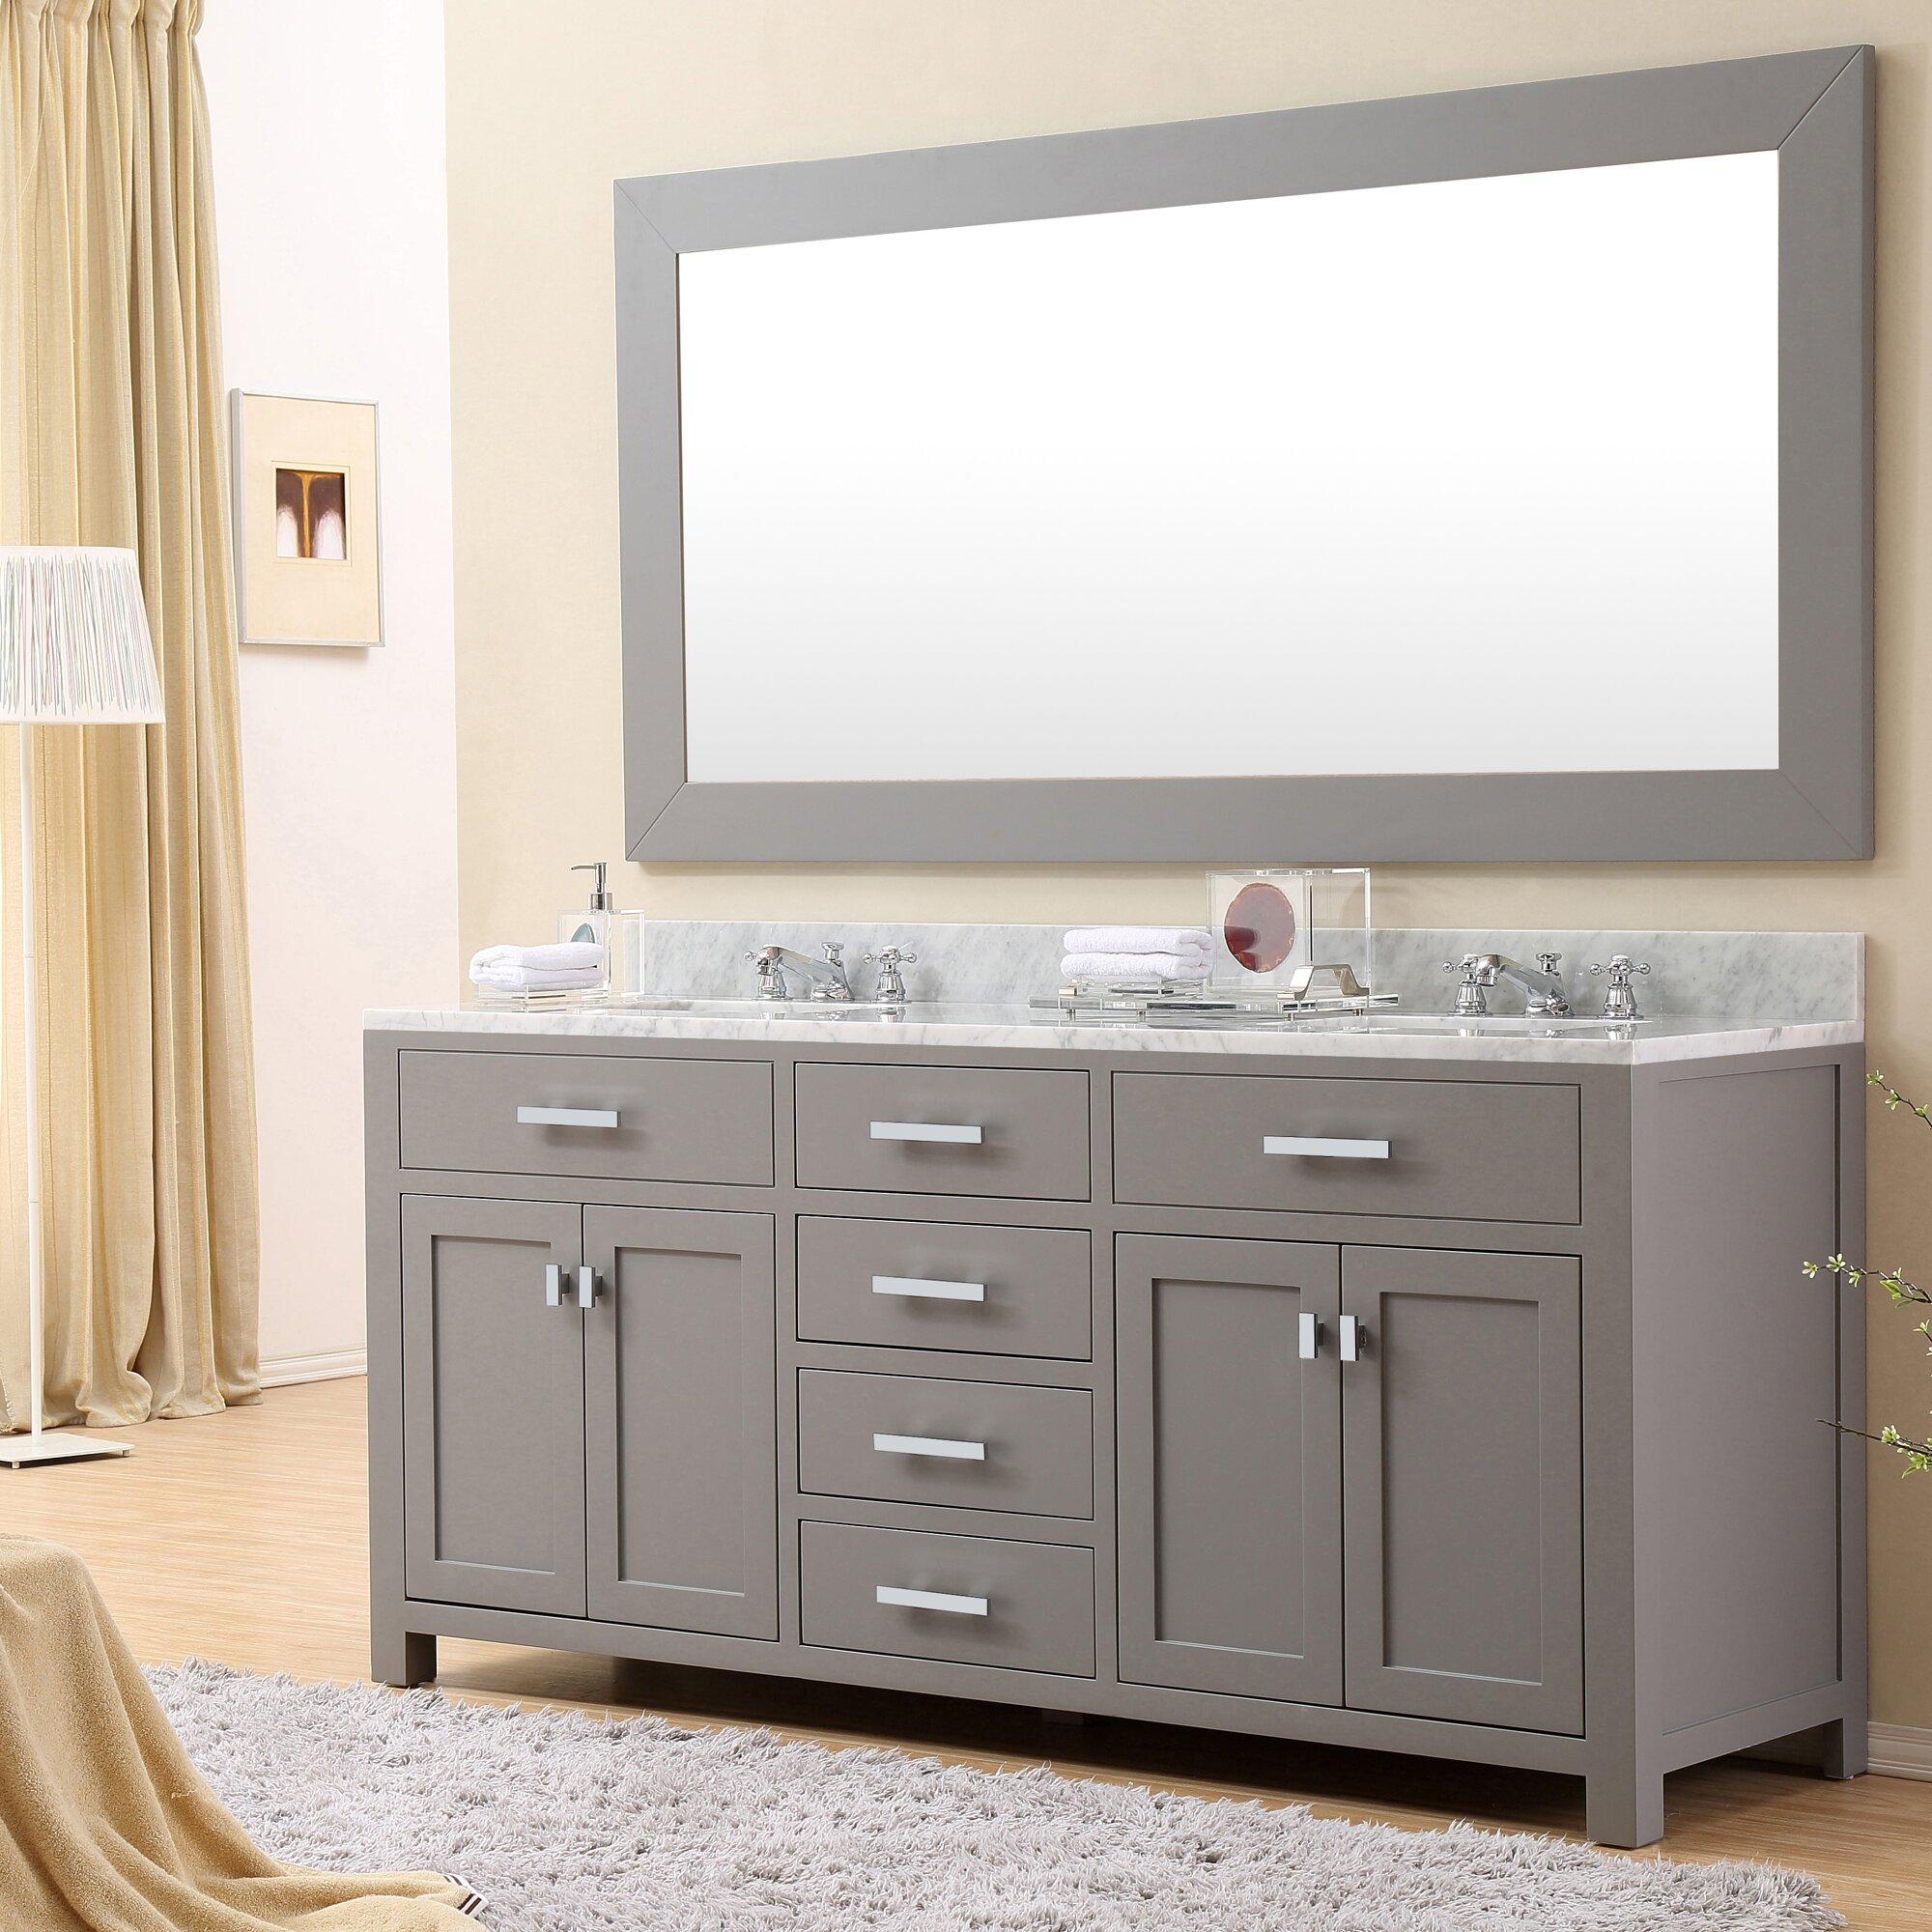 "Double Sink Mirrored Bathroom Vanity: DCOR Design Creighton 72"" Double Sink Bathroom Vanity Set"